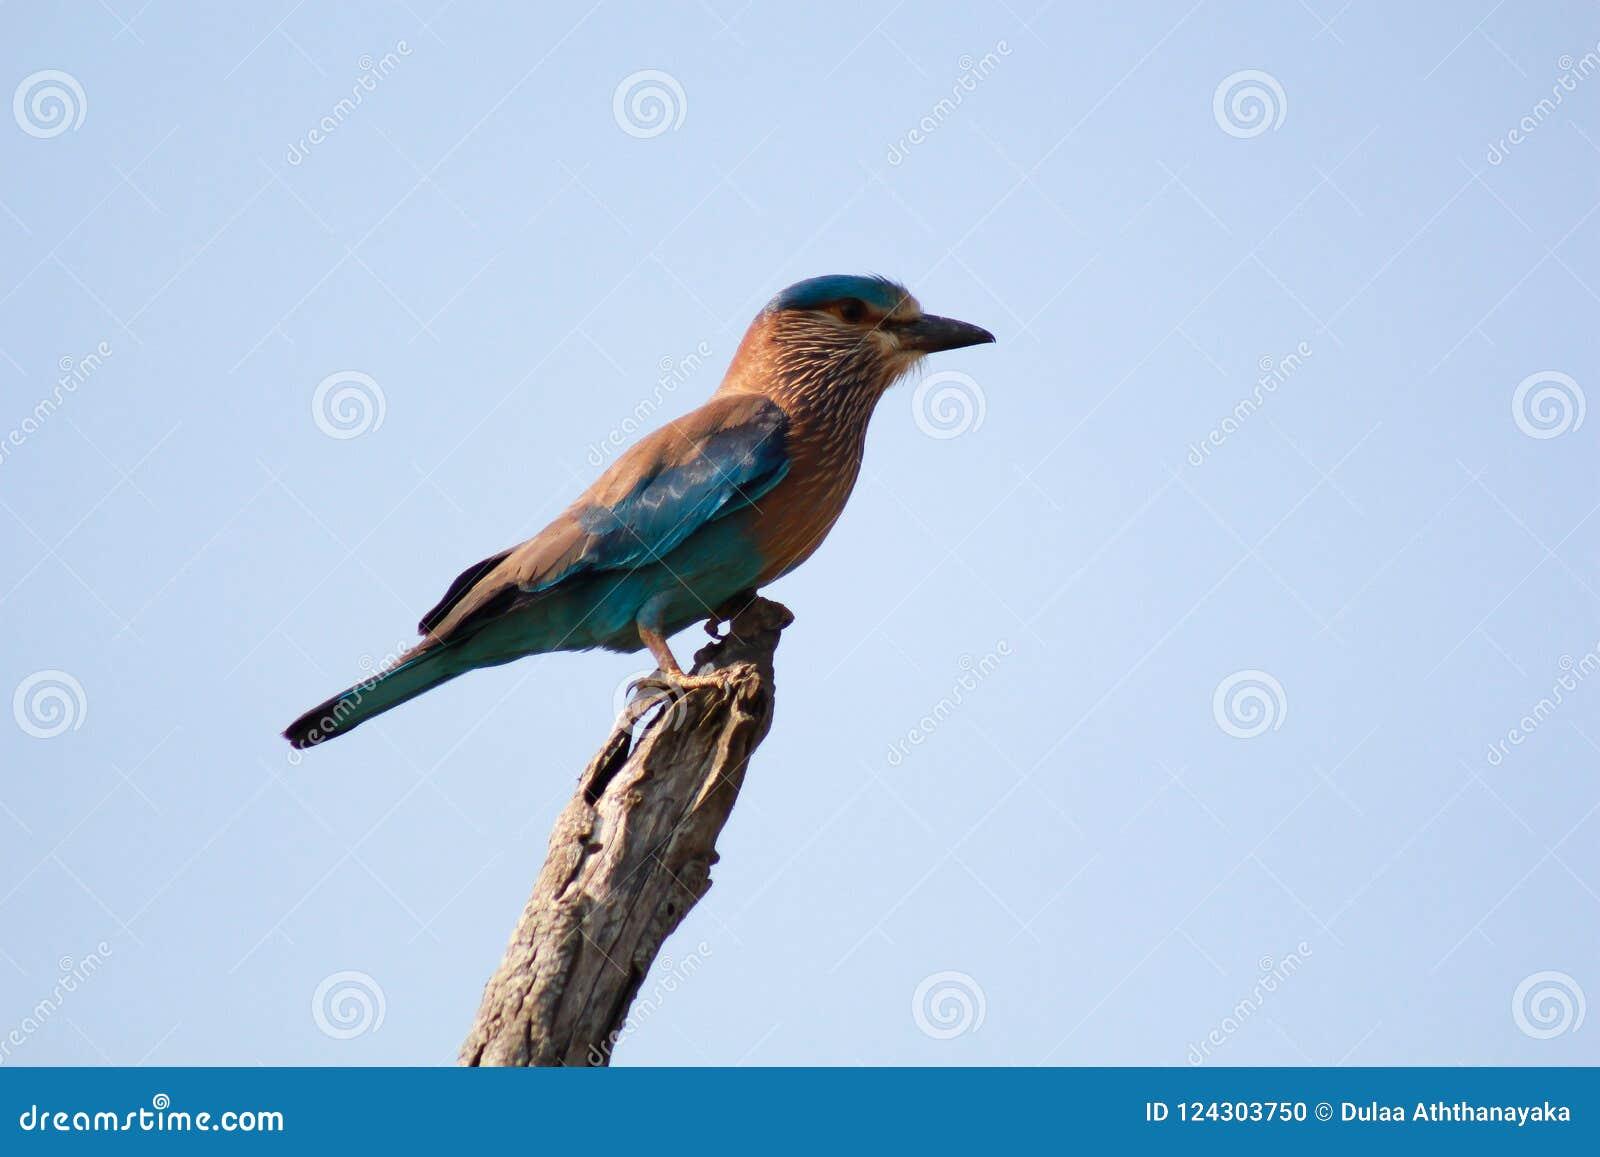 The Sri Lanka blue magpie or Ceylon magpie Urocissa ornata